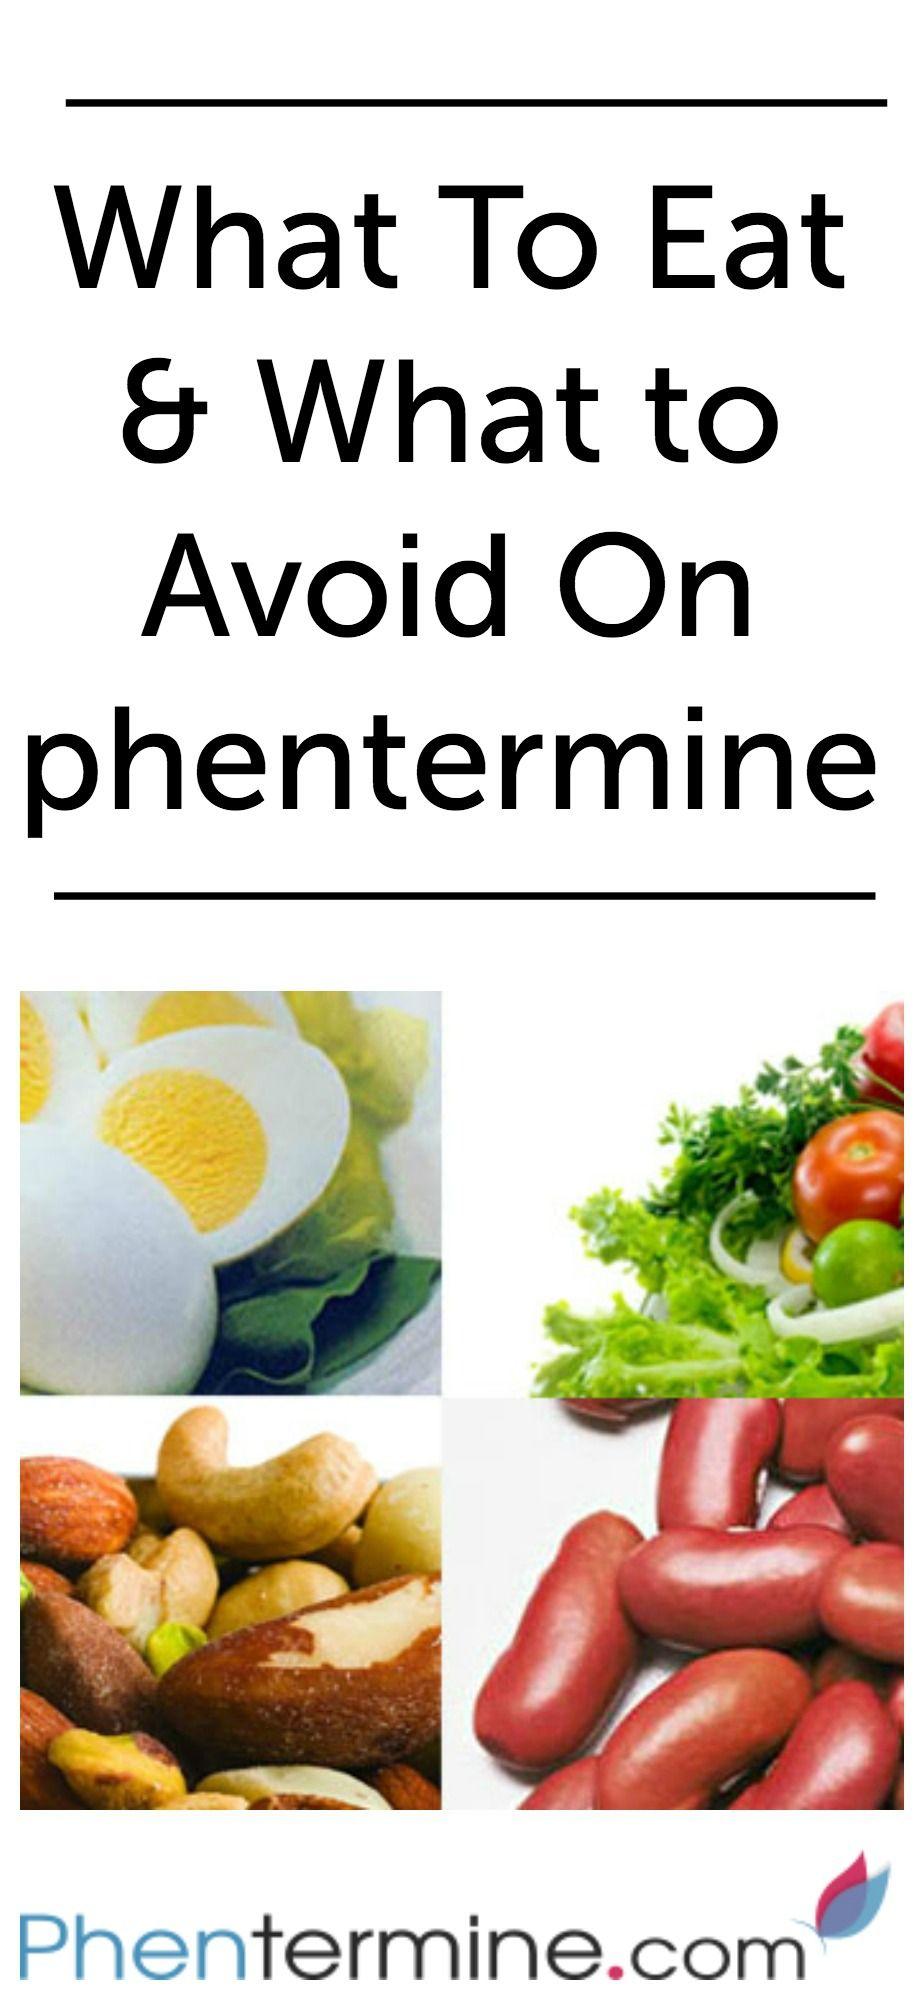 meal plan while taking phentermine